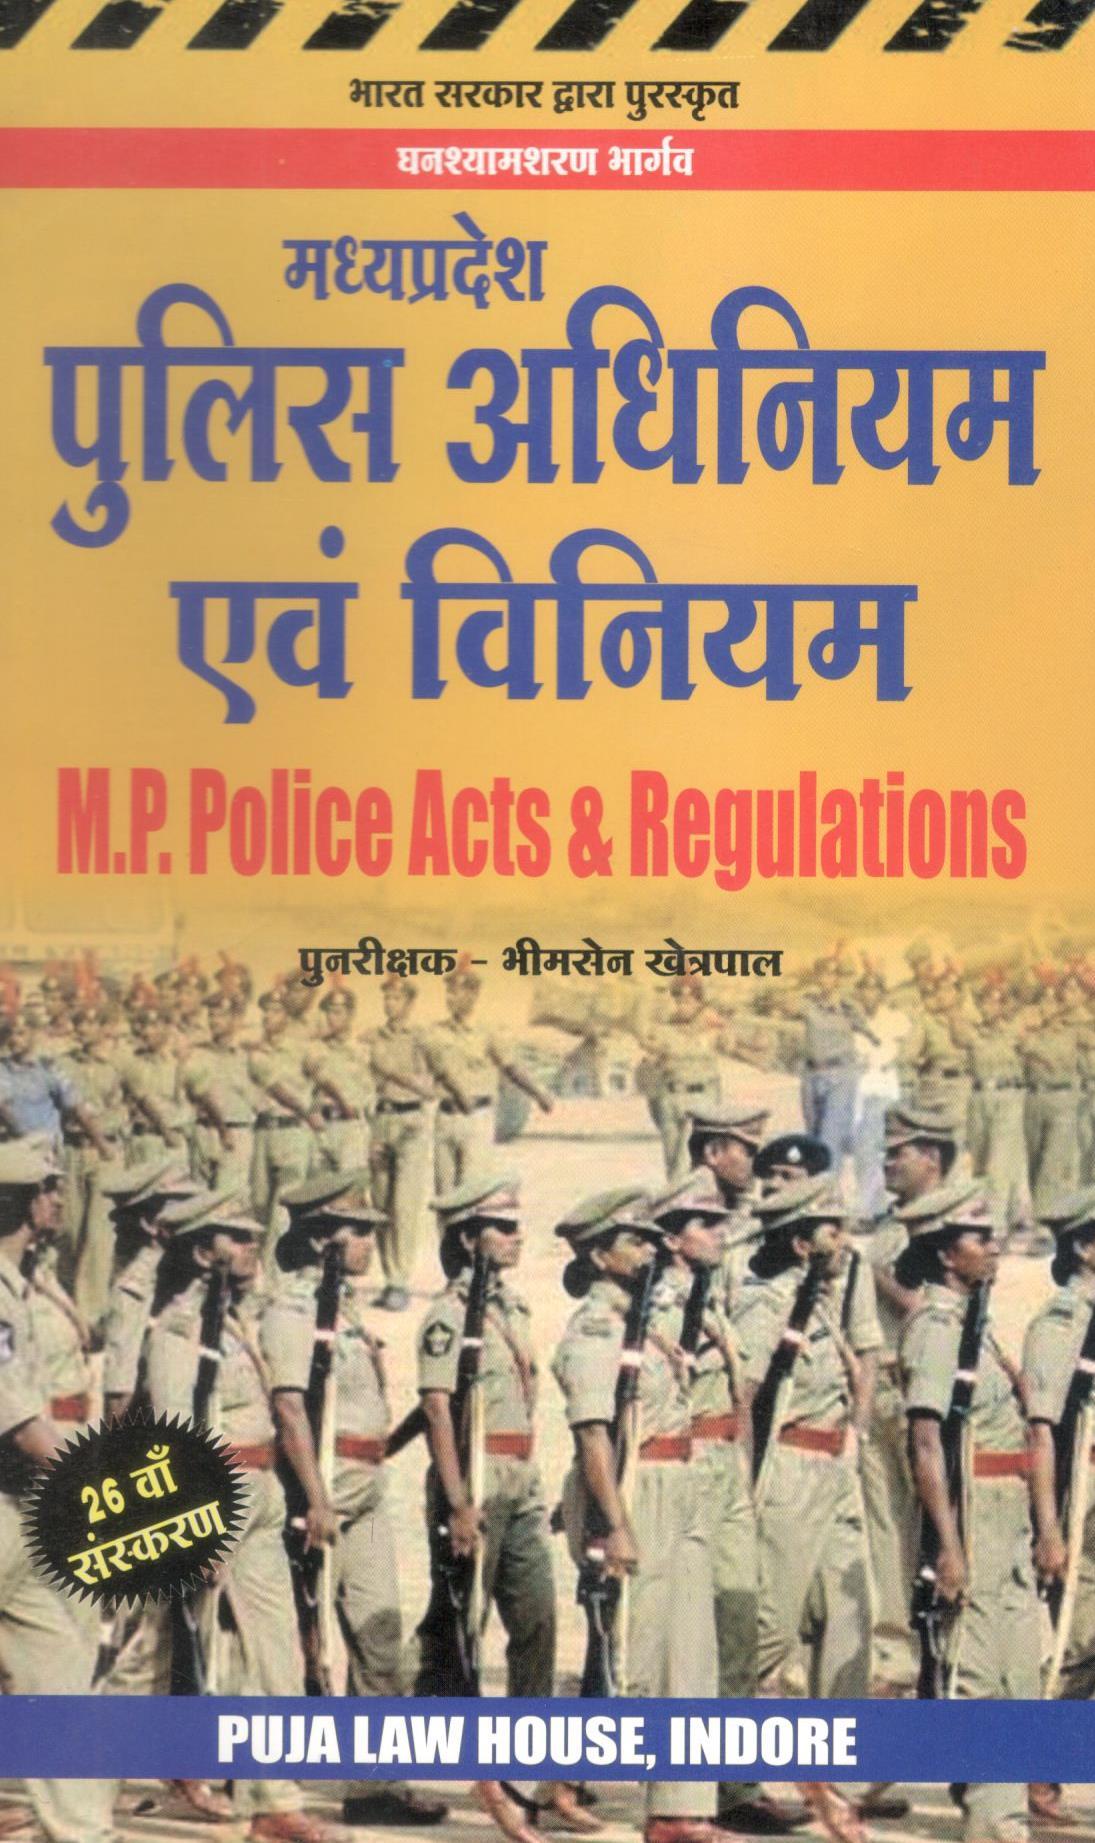 घनश्यामशरण भार्गव - मध्य प्रदेश पुलिस अधिनियम एवं विनियम / Madhya Pradesh Police Acts & Regulations